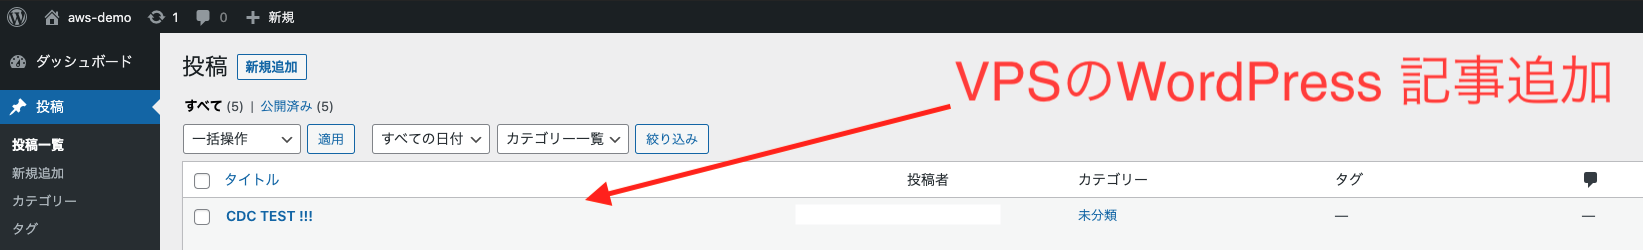 https://cdn-ssl-devio-img.classmethod.jp/wp-content/uploads/2021/06/2021-06-03_13.41.39.png